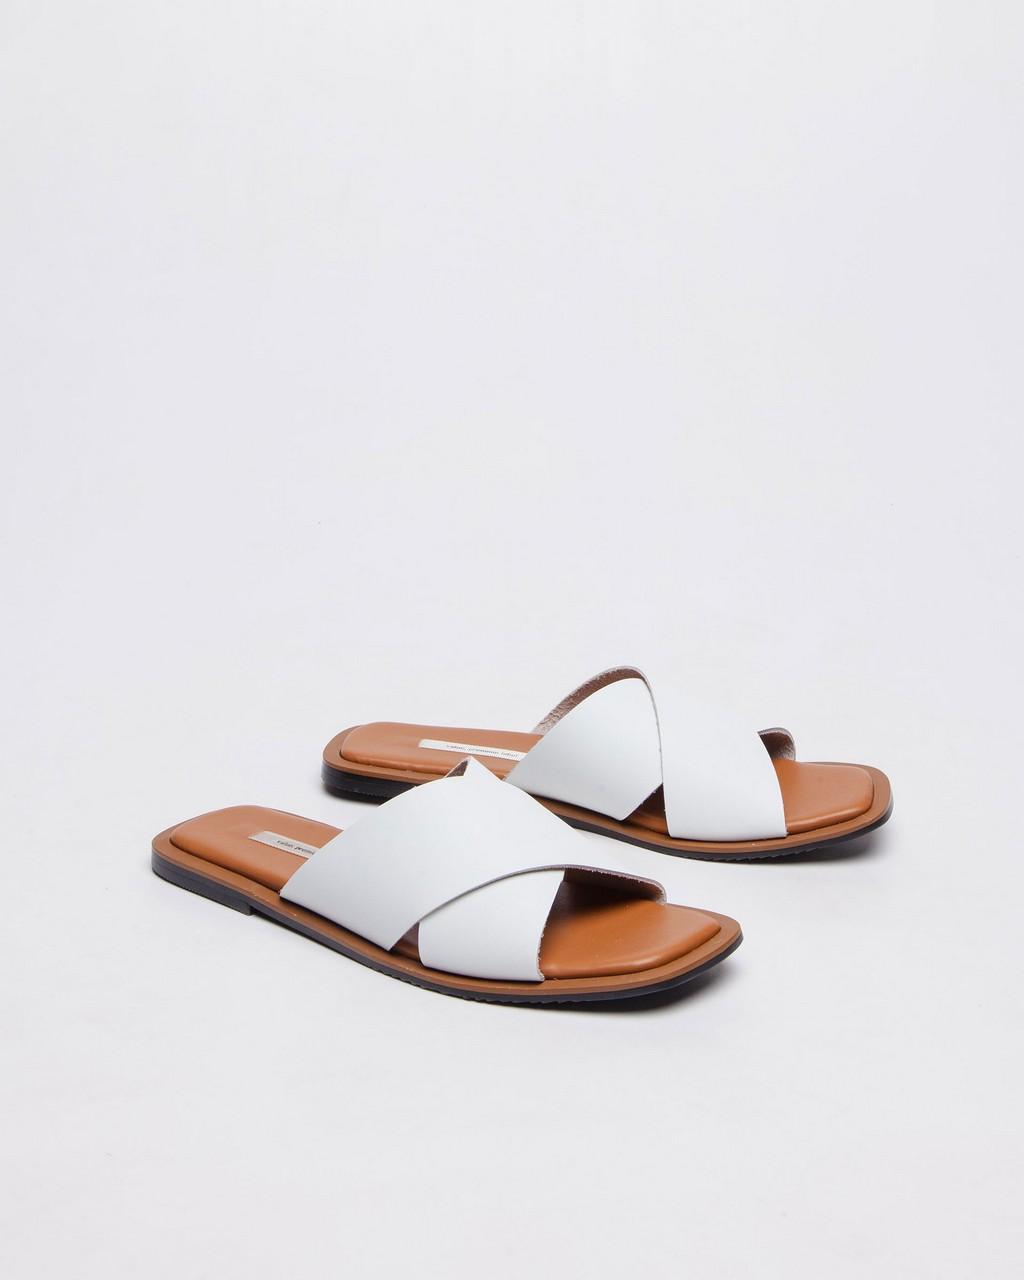 Tagtraume Nordic - White(화이트)